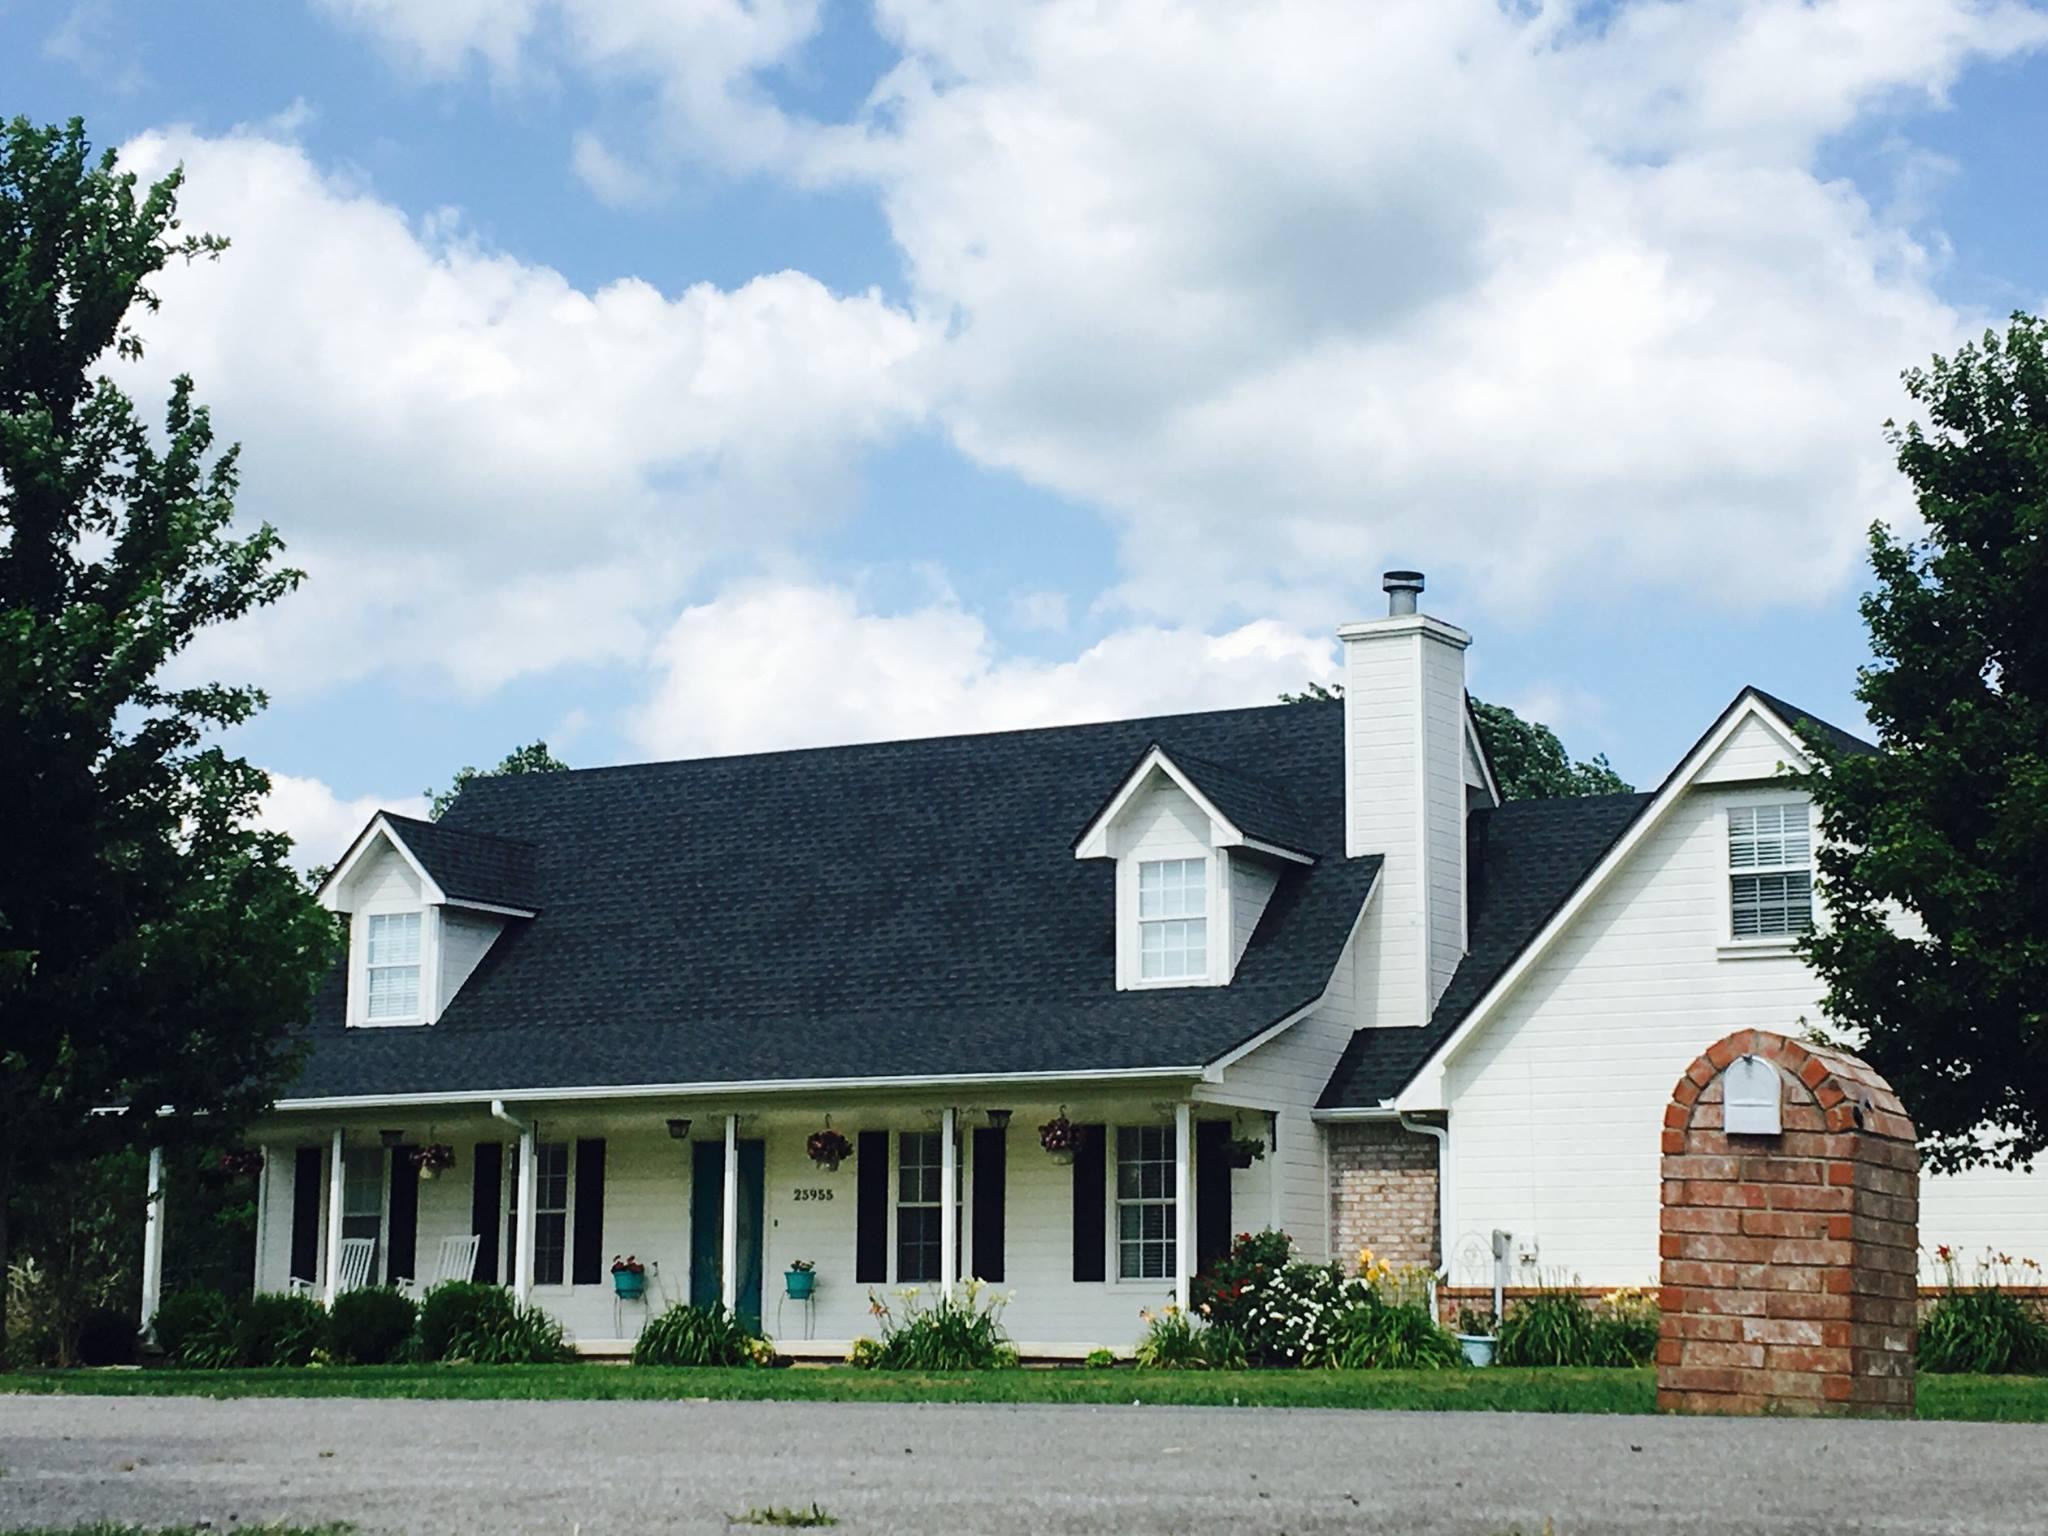 Arrowhead Roofing image 0